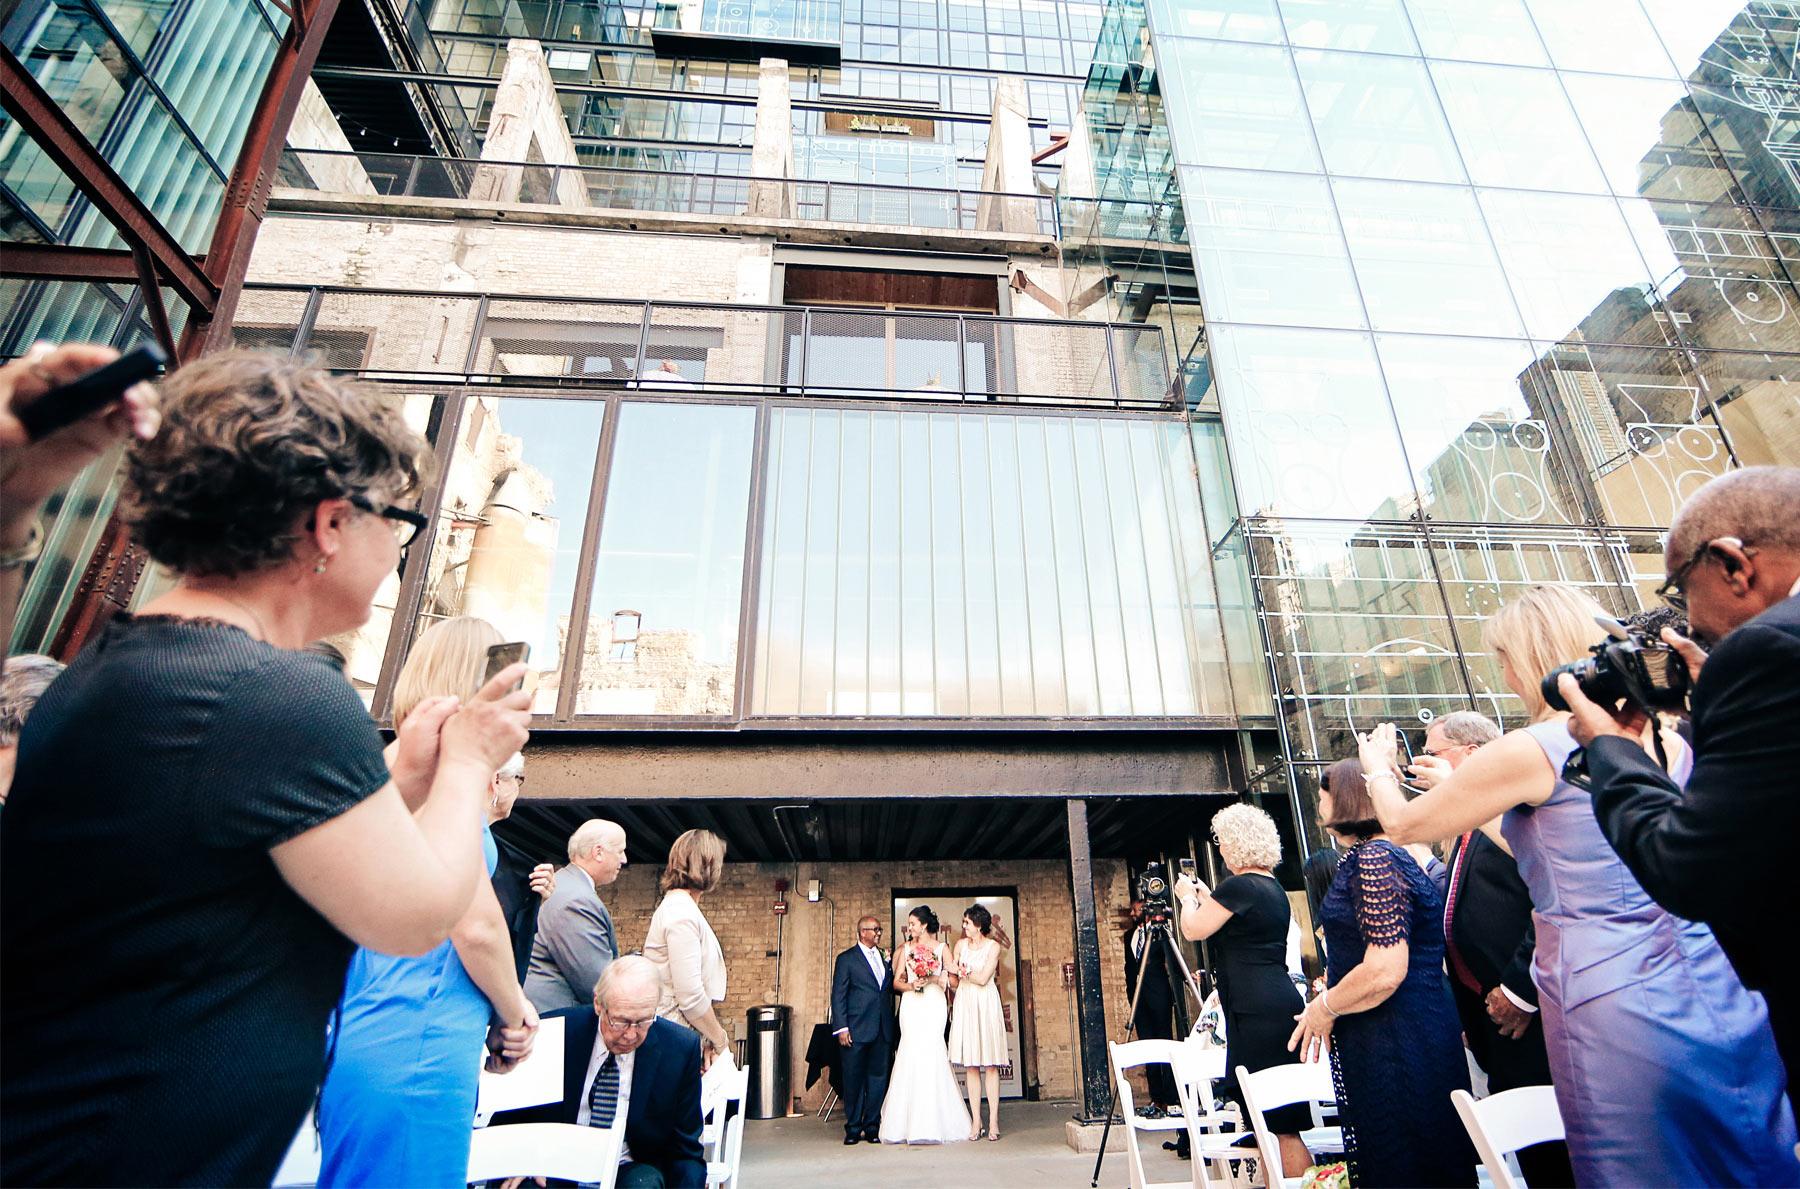 14-Minneapolis-Minnesota-Wedding-Photography-by-Vick-Photography-Downtown-Mill-City-Museum-Ceremony-Outdoor-Wedding-Lalu-&-John.jpg